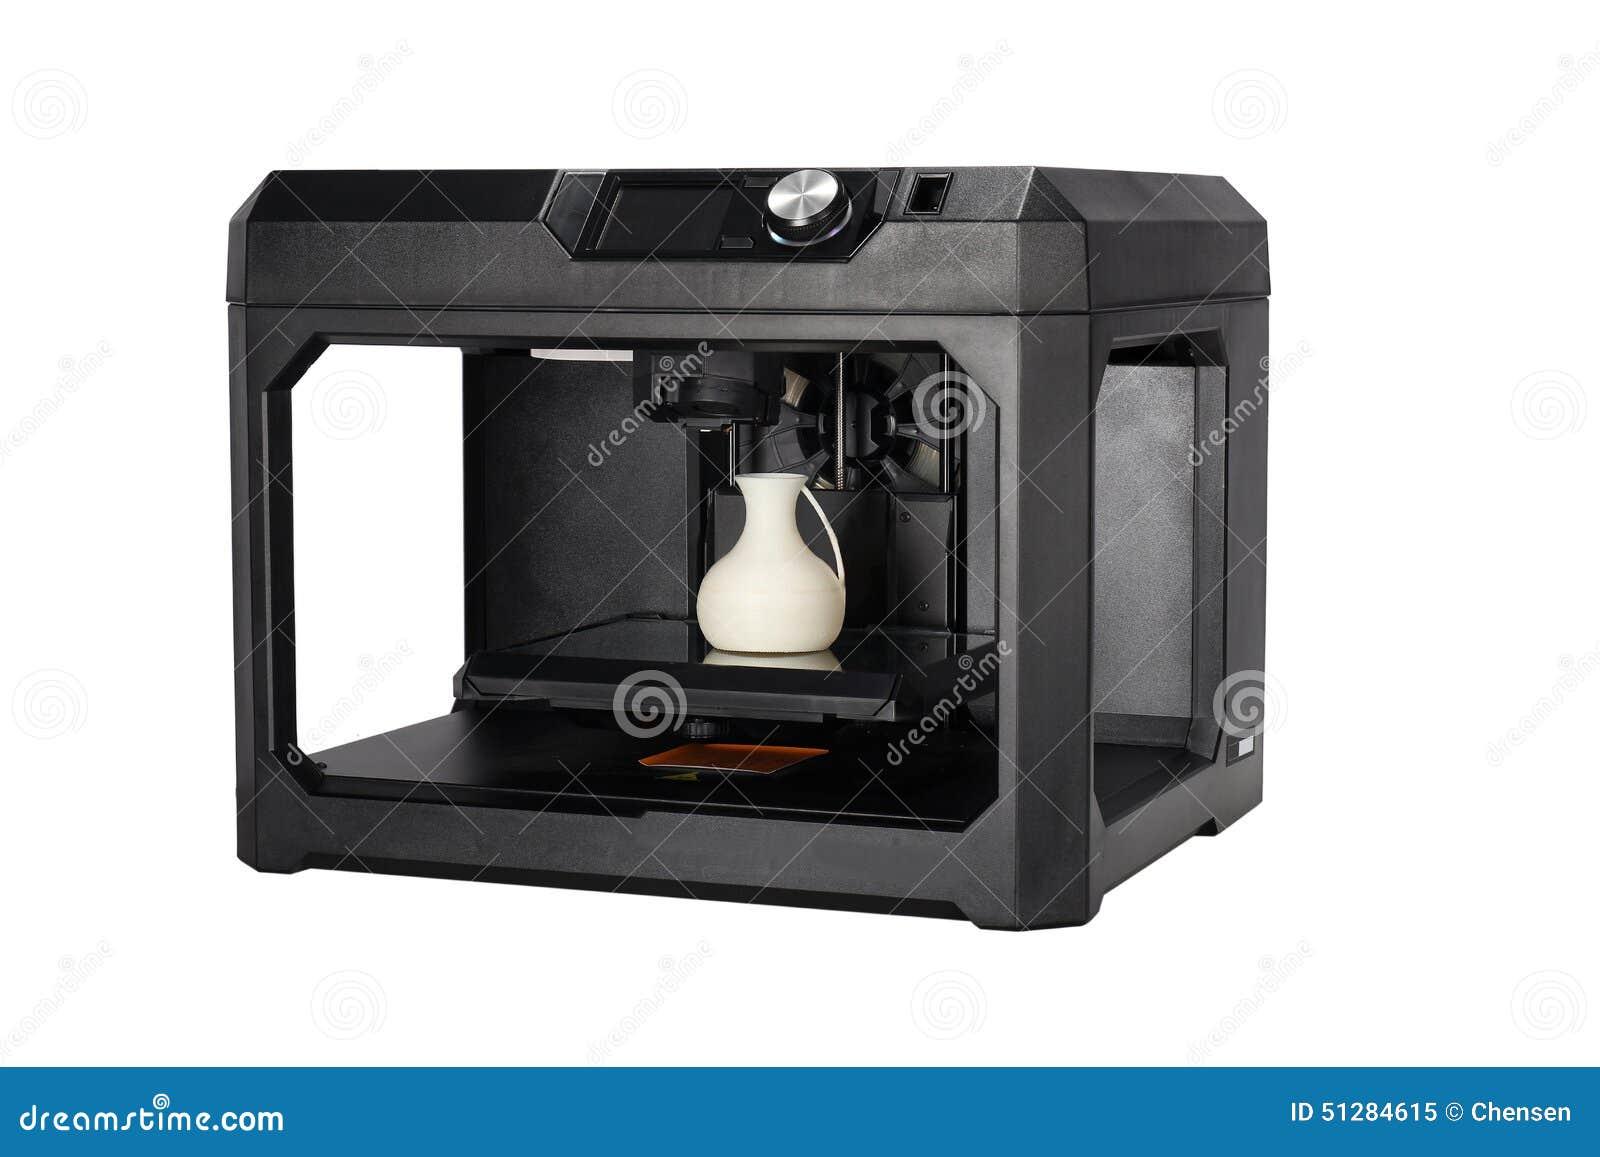 3D Printing Technology Stock Photo - Image: 51284615